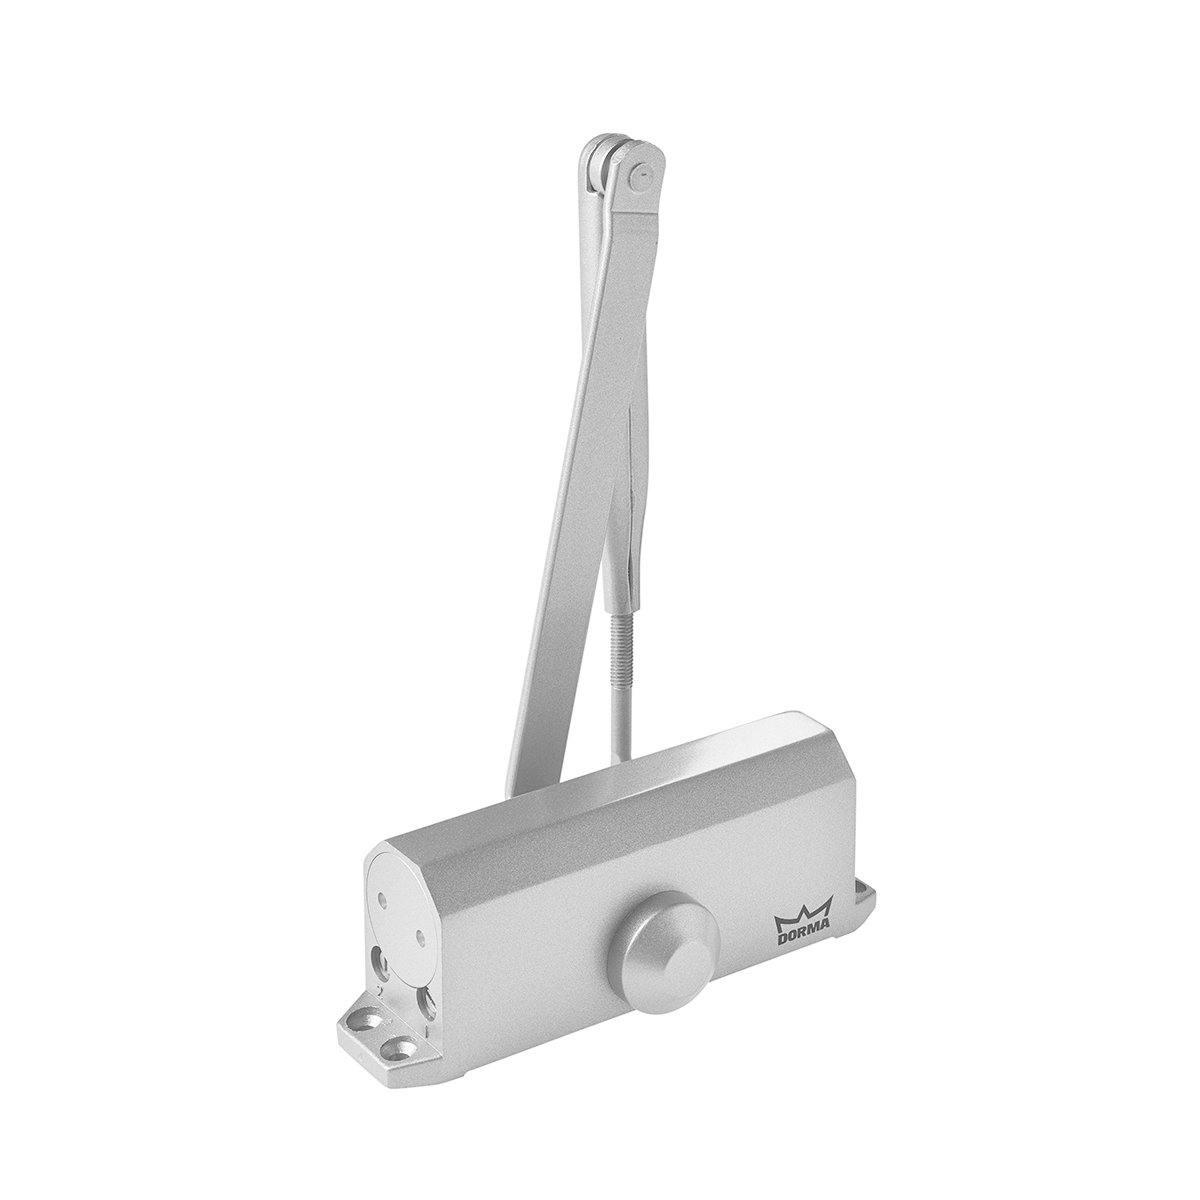 Dorma TS77 Regular Arm Door Closer - Hydraulic Speed Control. EN 3/4